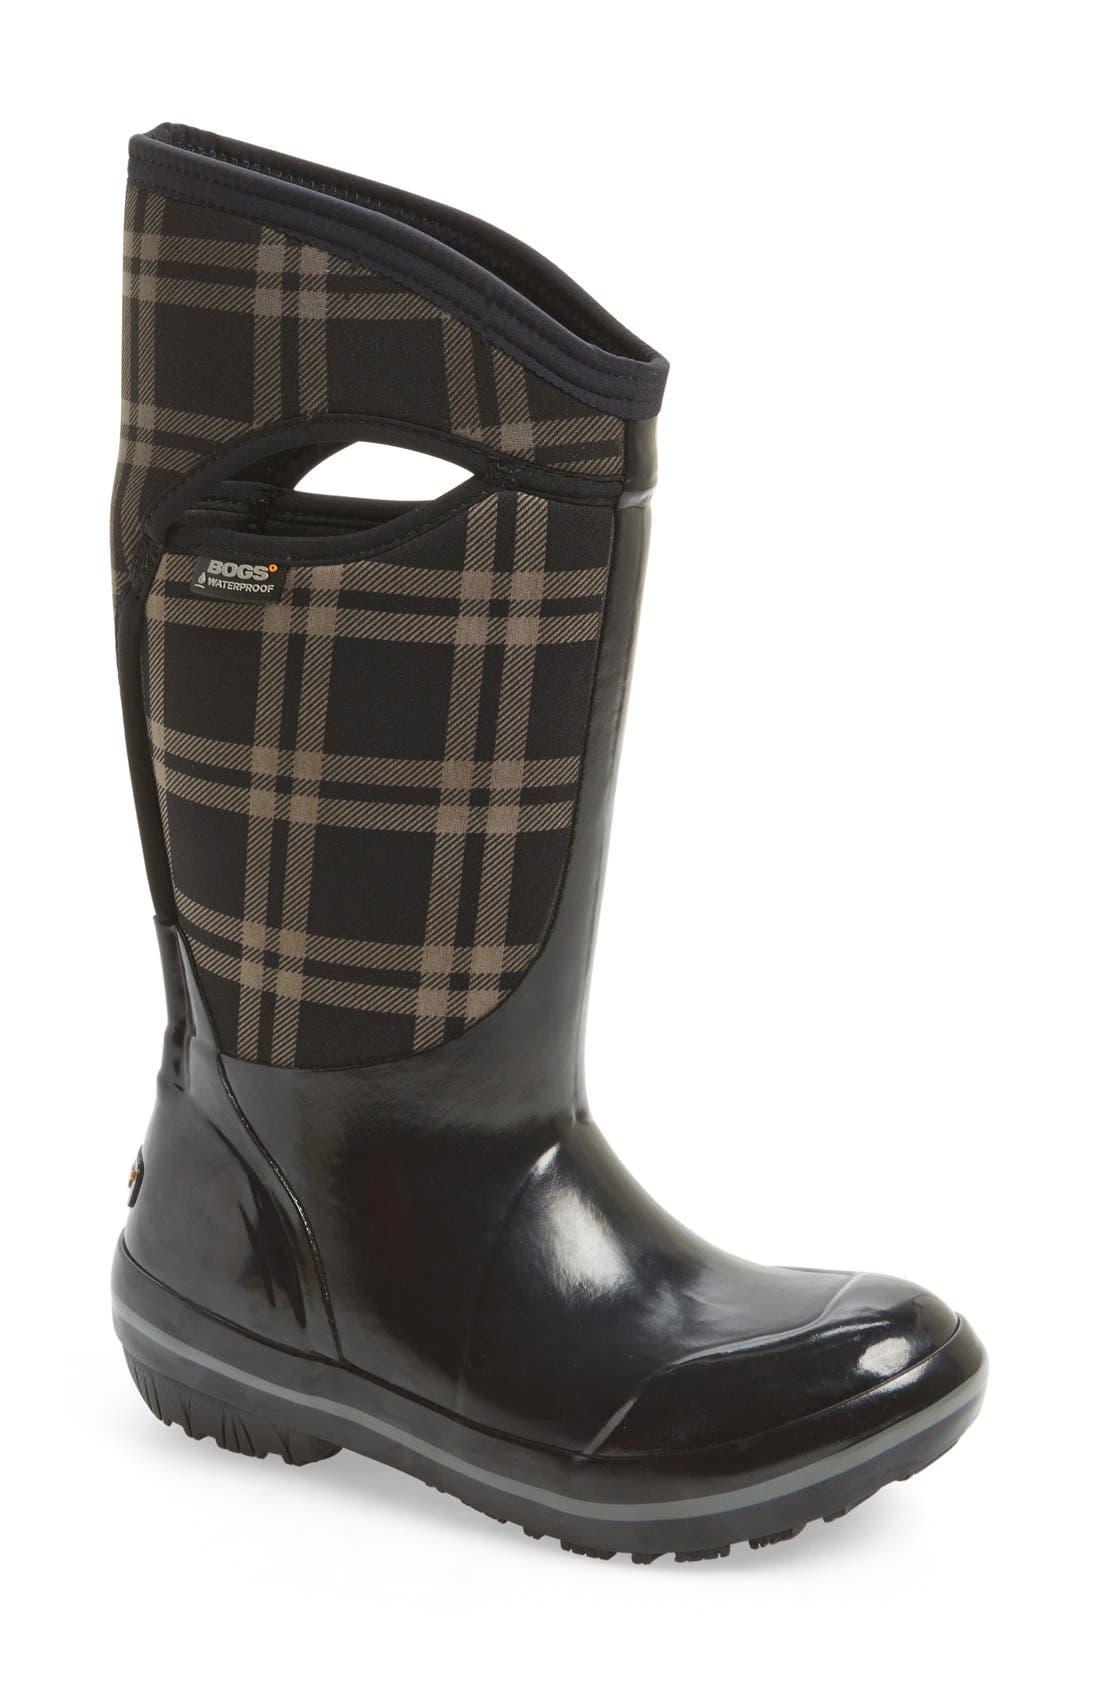 Main Image - Bogs 'Plimsoll' Waterproof Boot (Women)